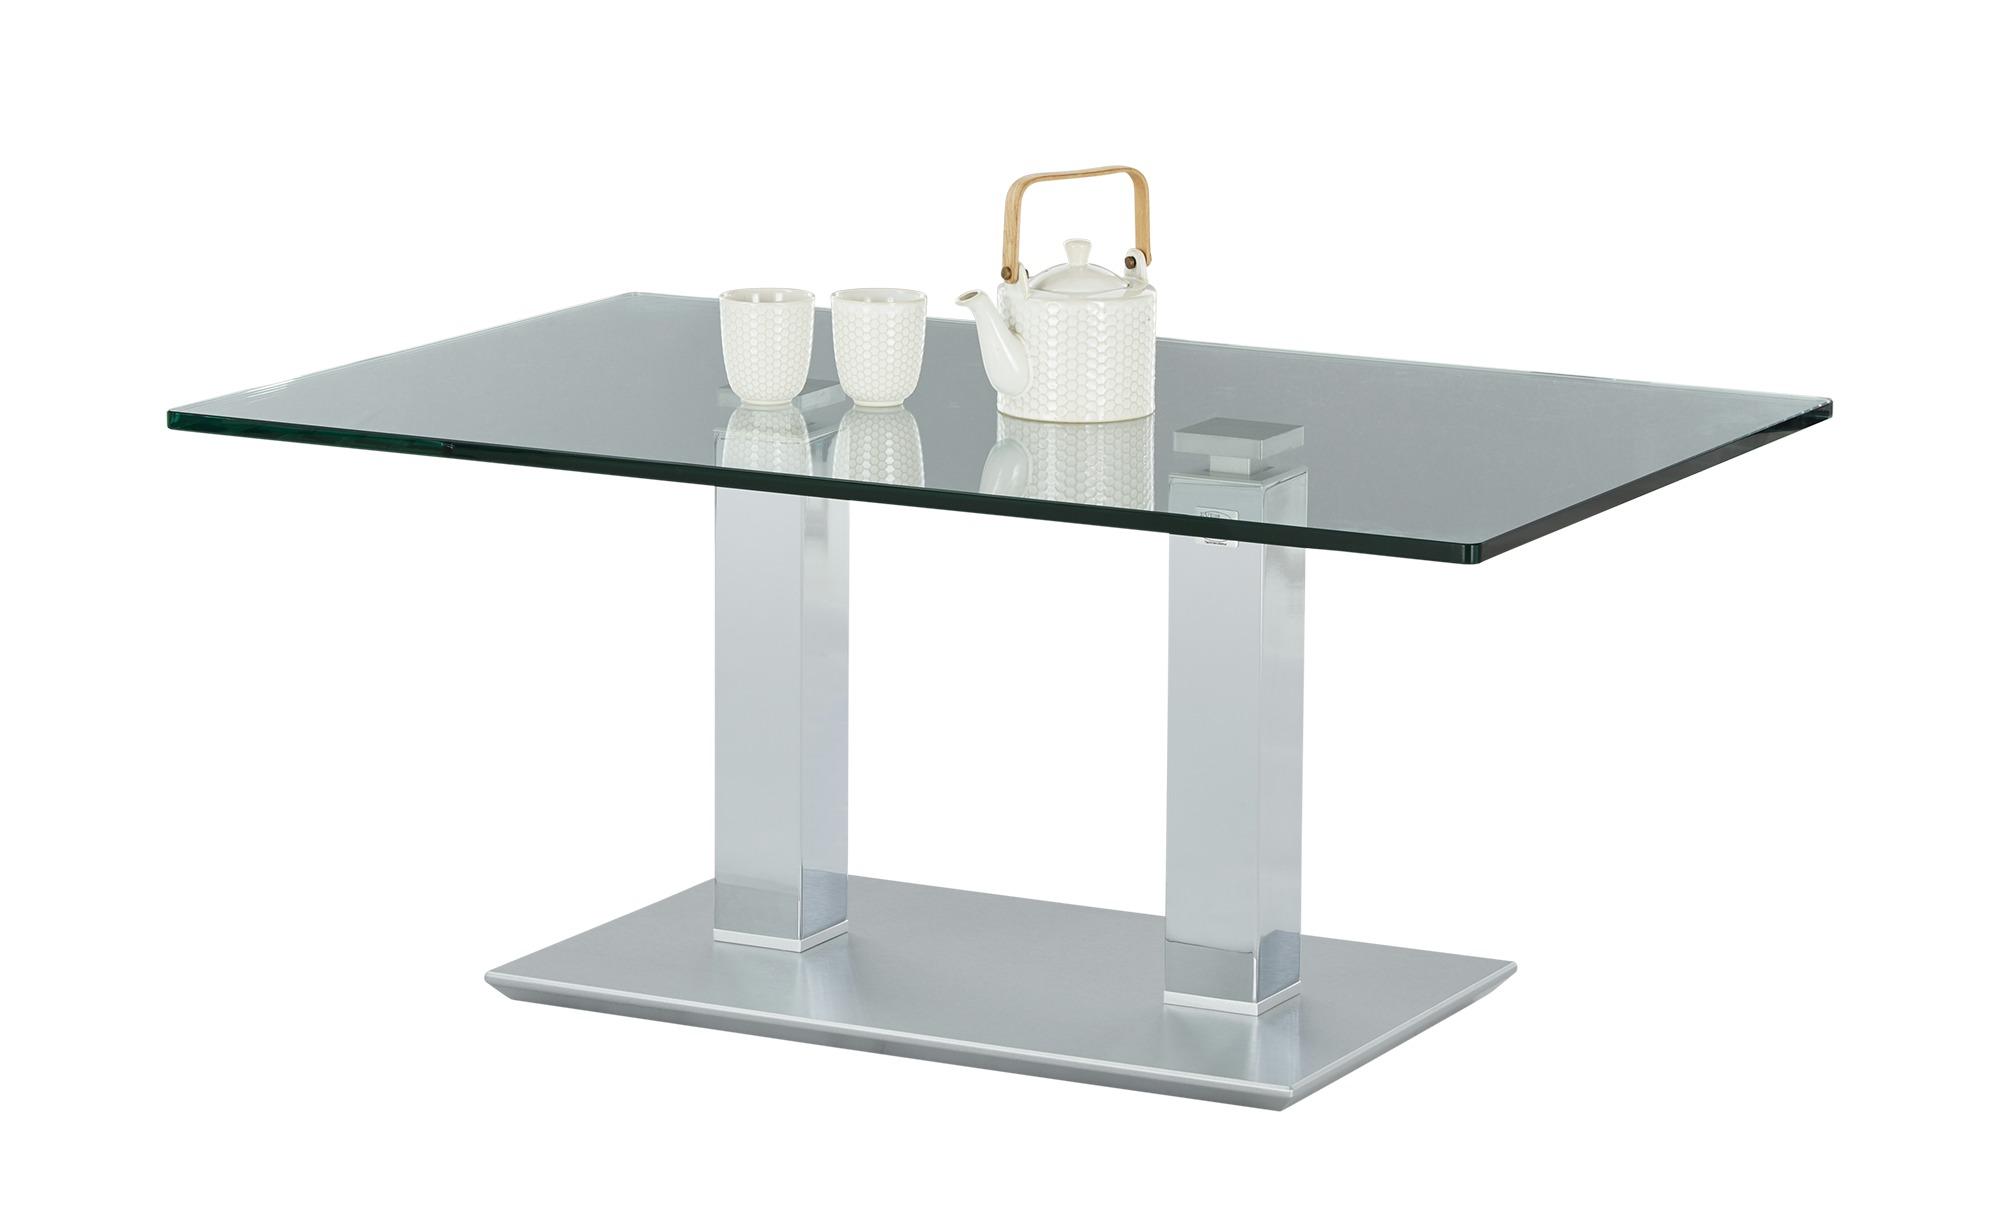 Couchtisch  Rimini Deluxe ¦ silber ¦ Maße (cm): B: 70 H: 46 T: 70 Tische > Couchtische > Couchtische höhenverstellbar - Höffner